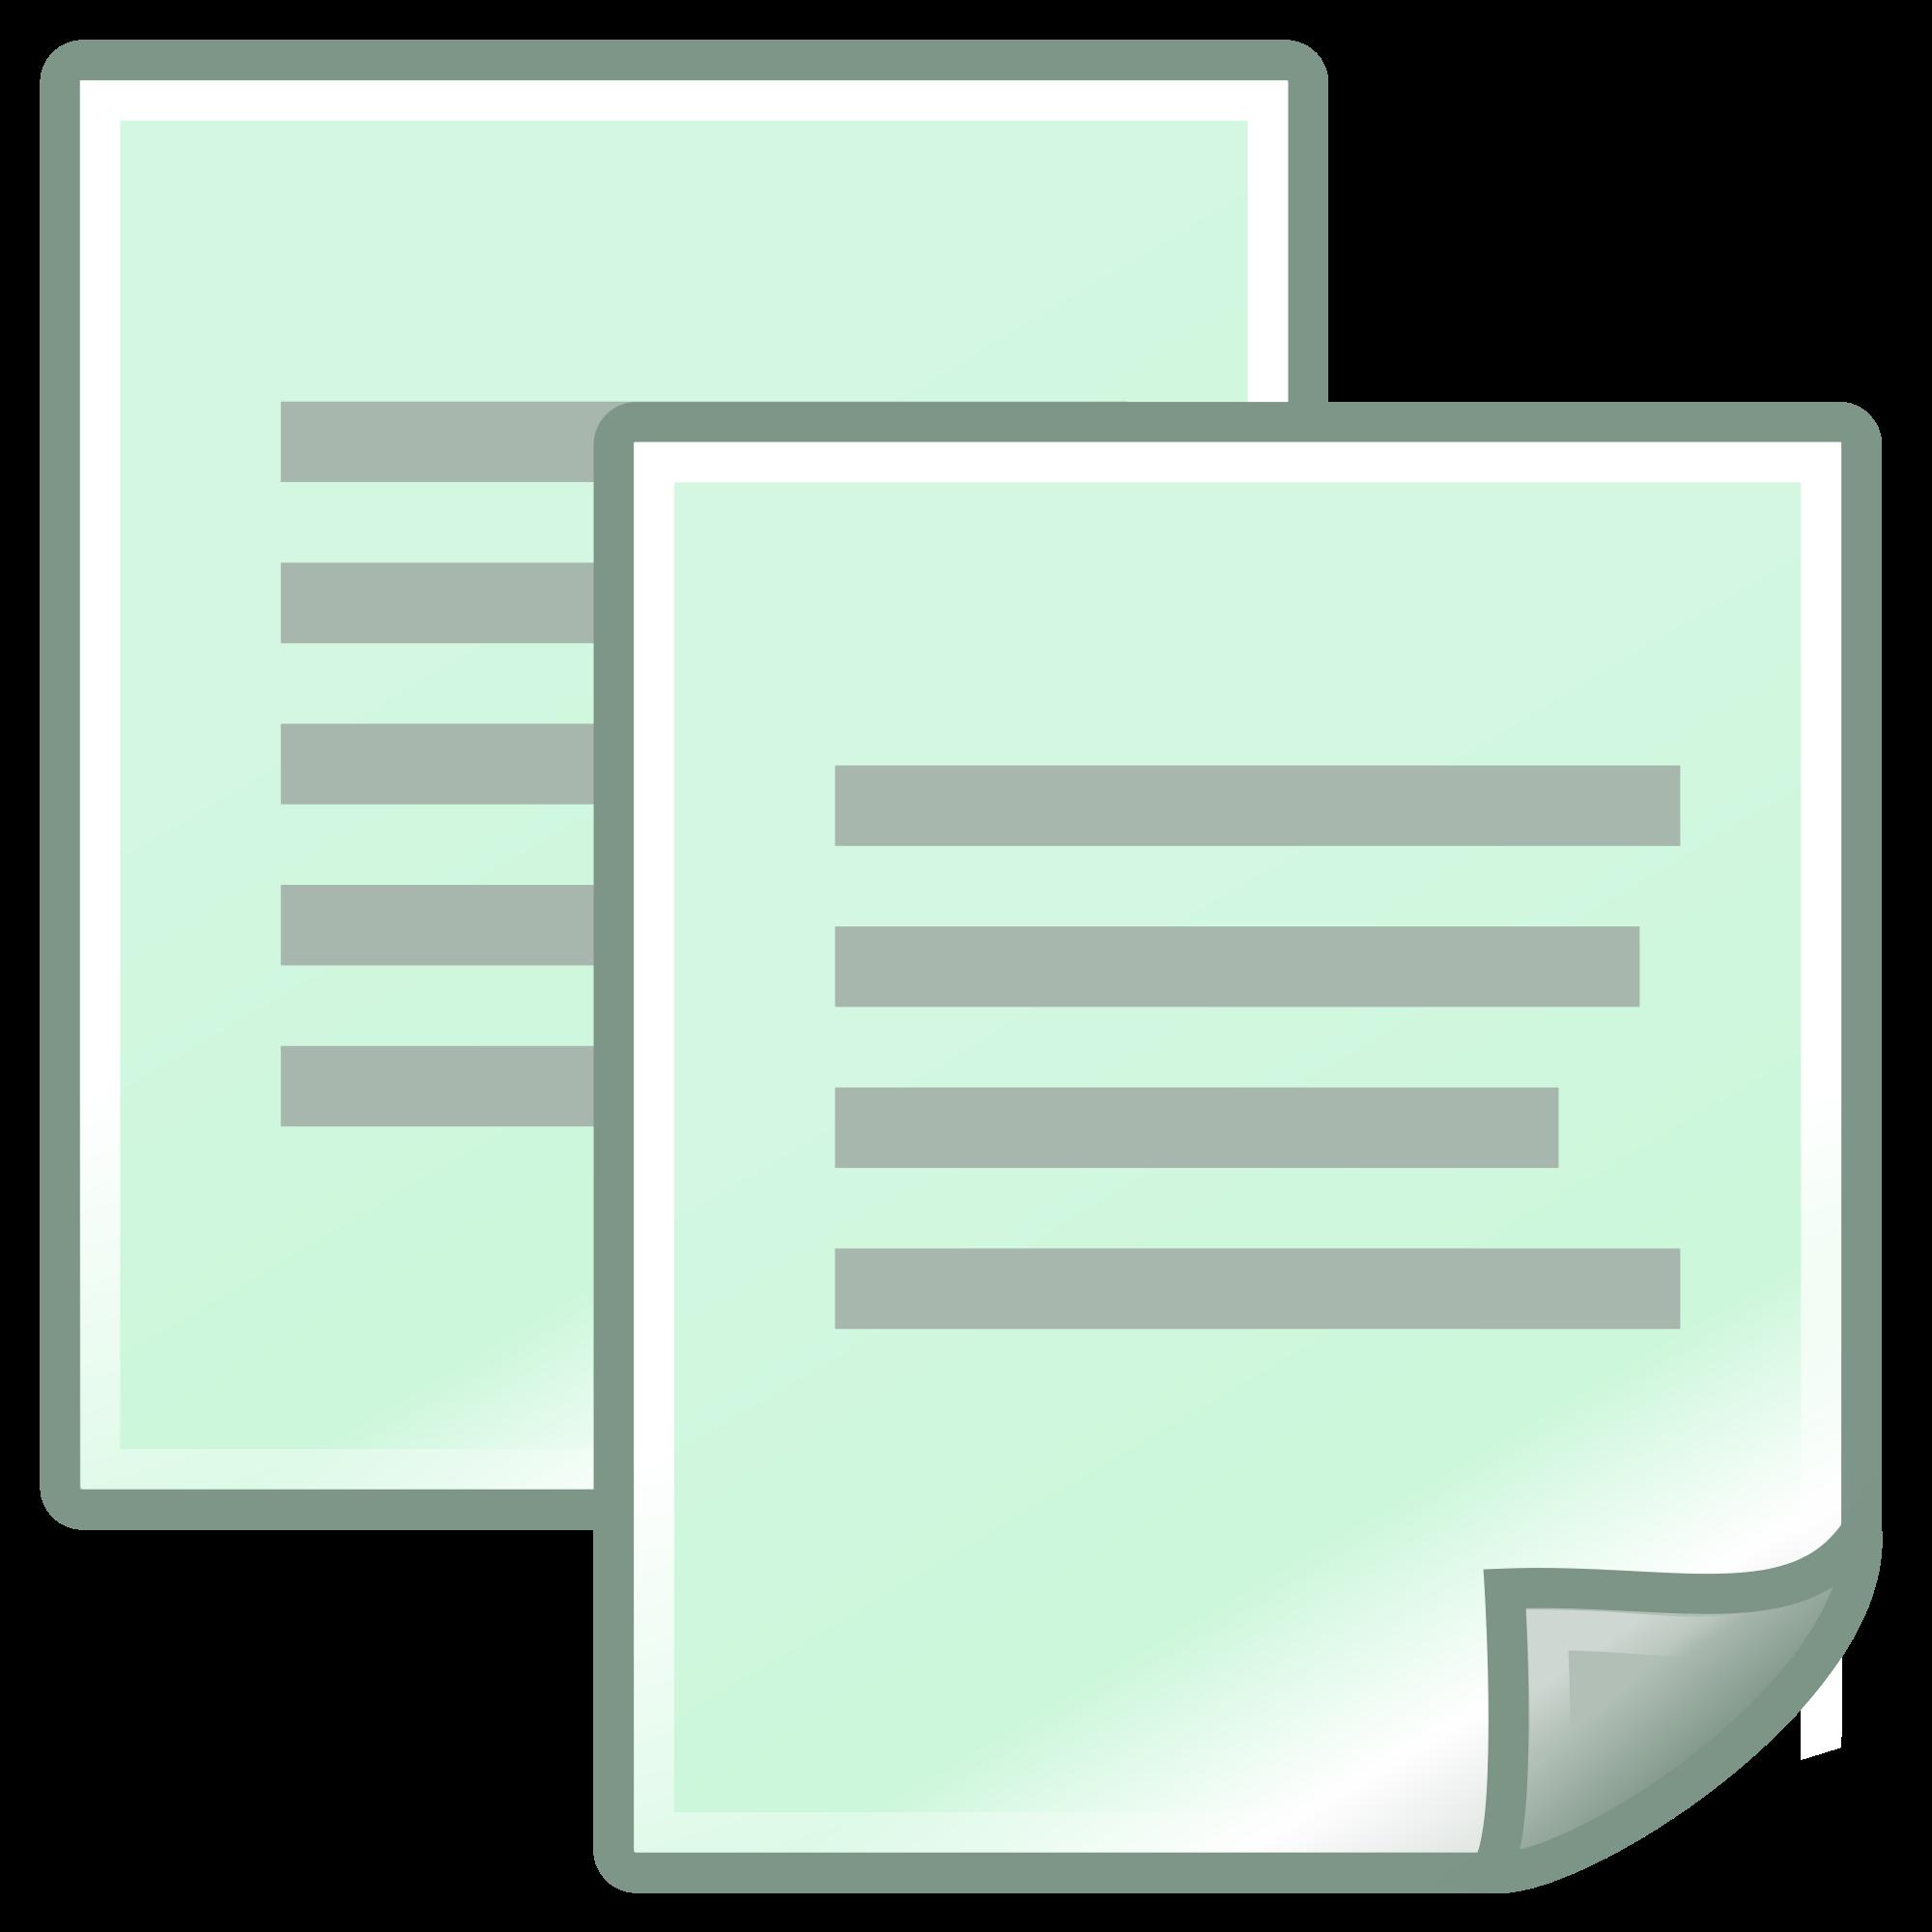 Copy Png 3 » PNG Image #180037.